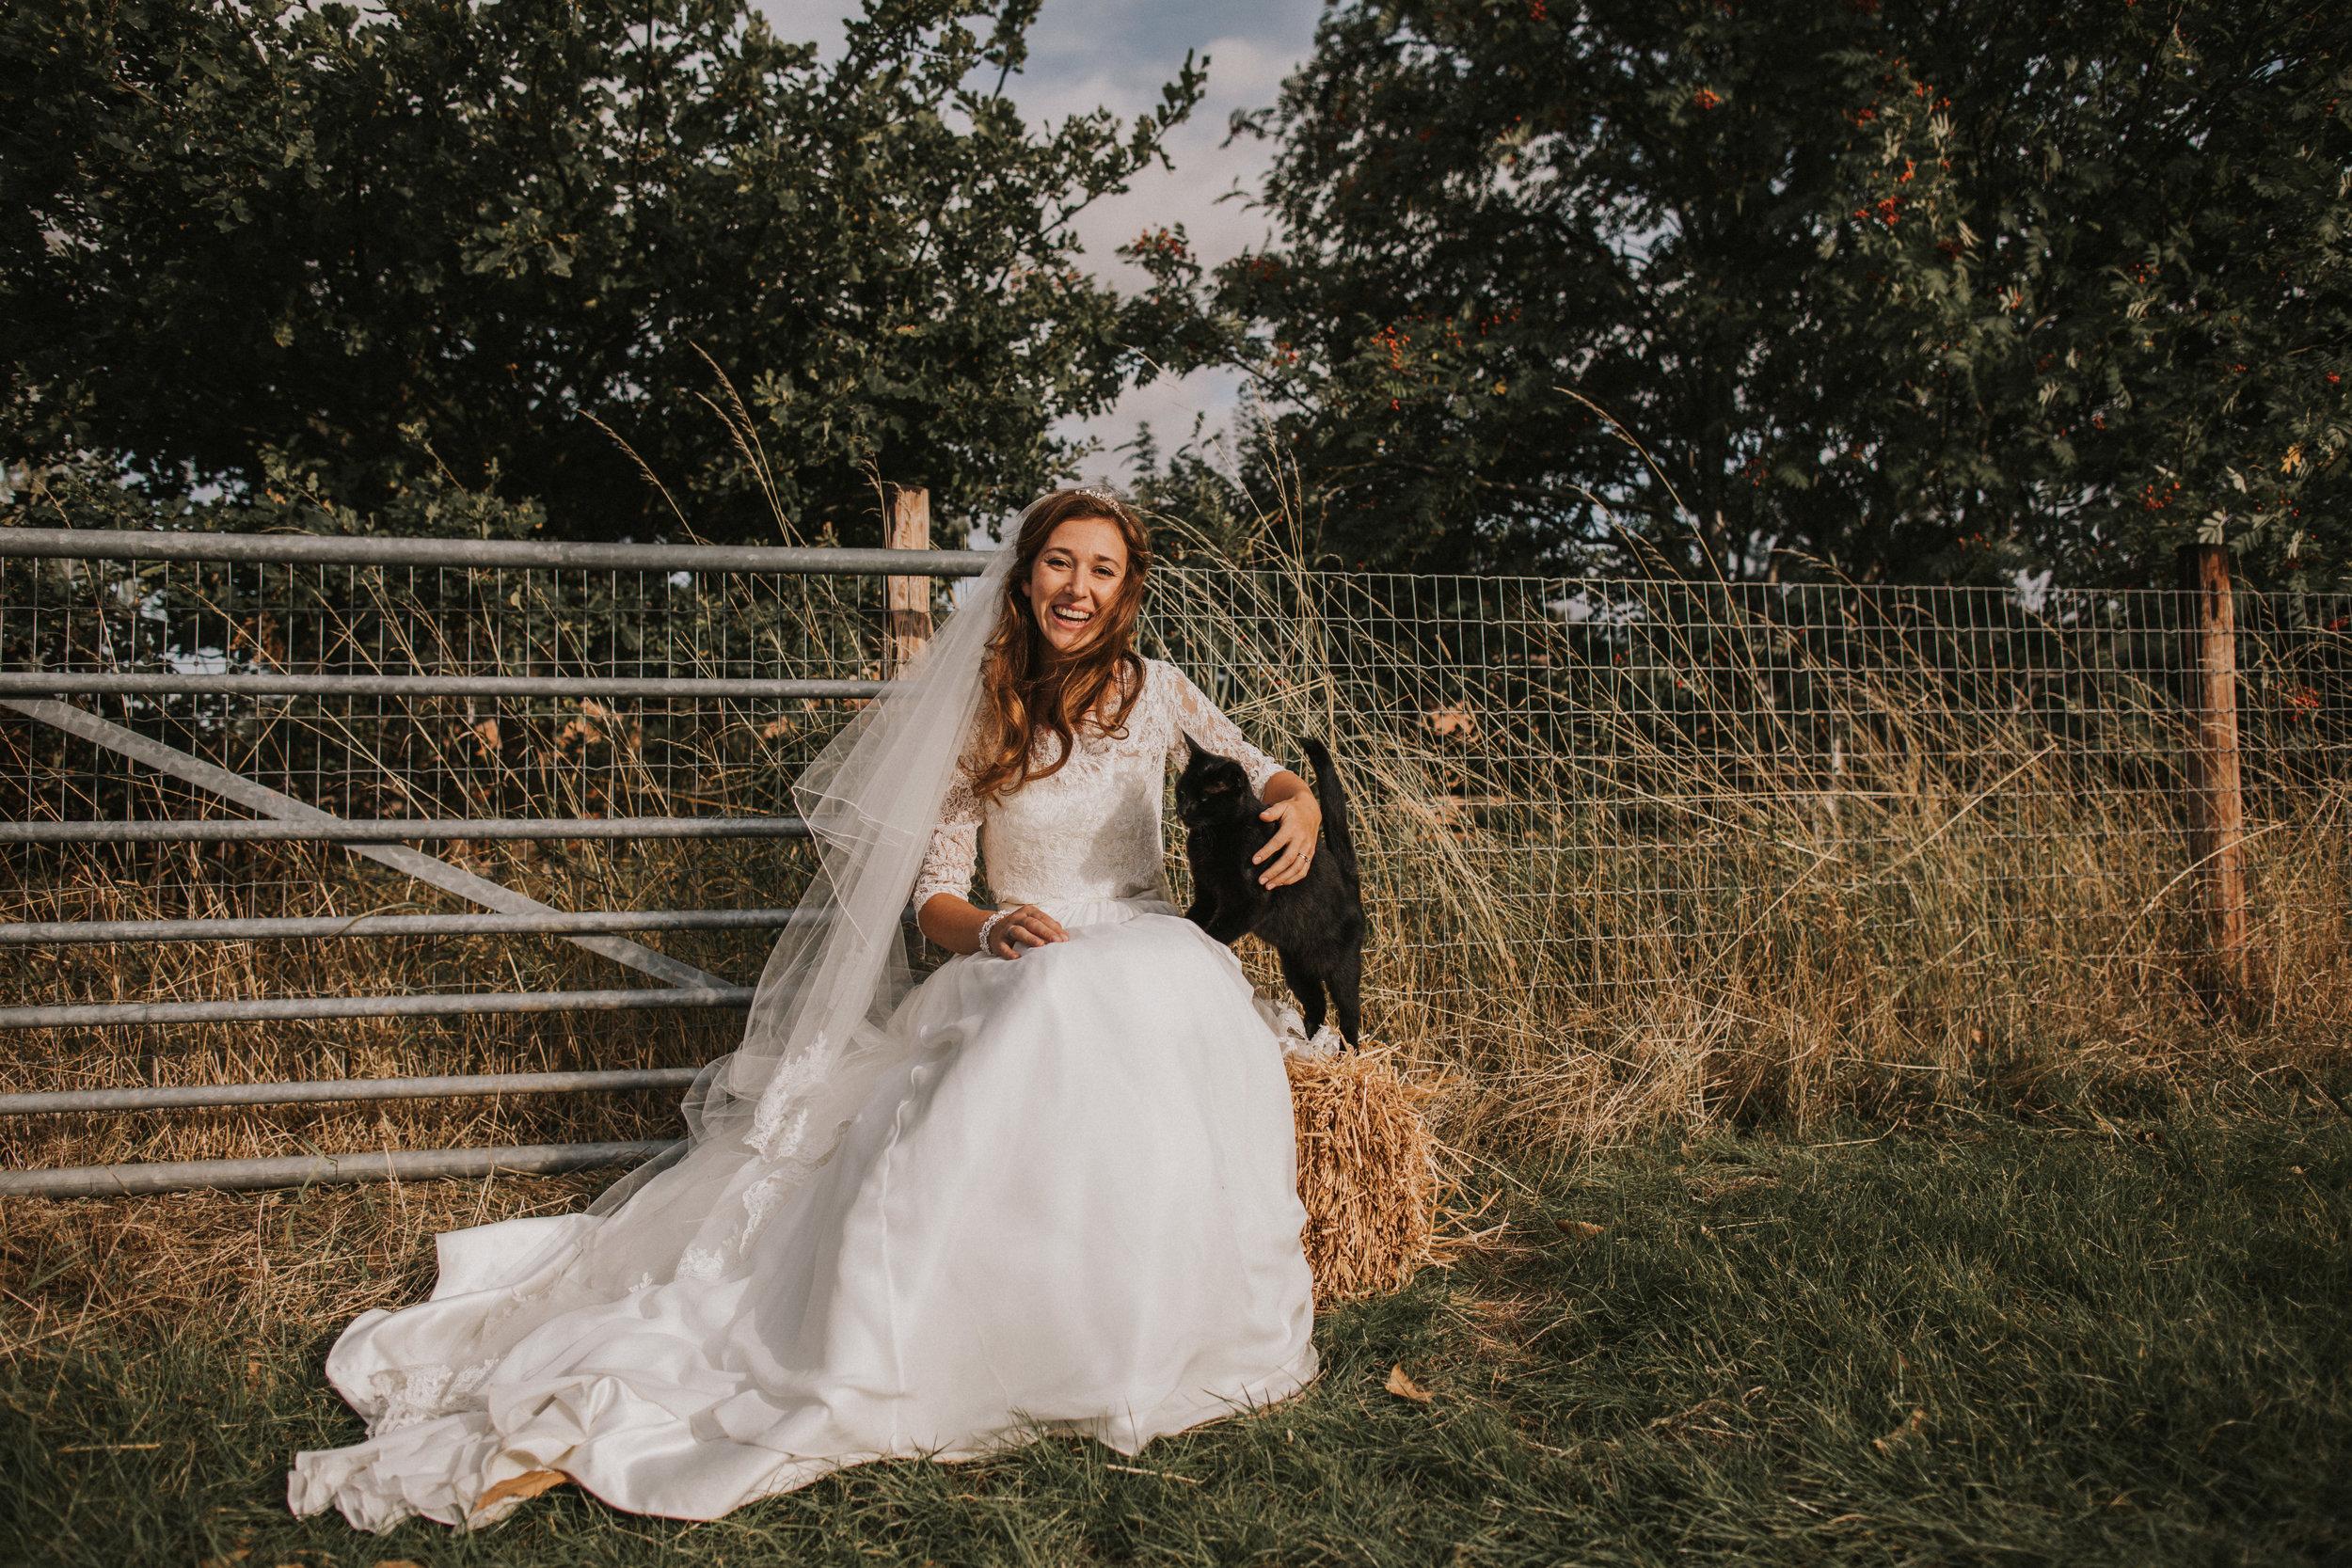 brook rose photography  Farm wedding_53.jpg